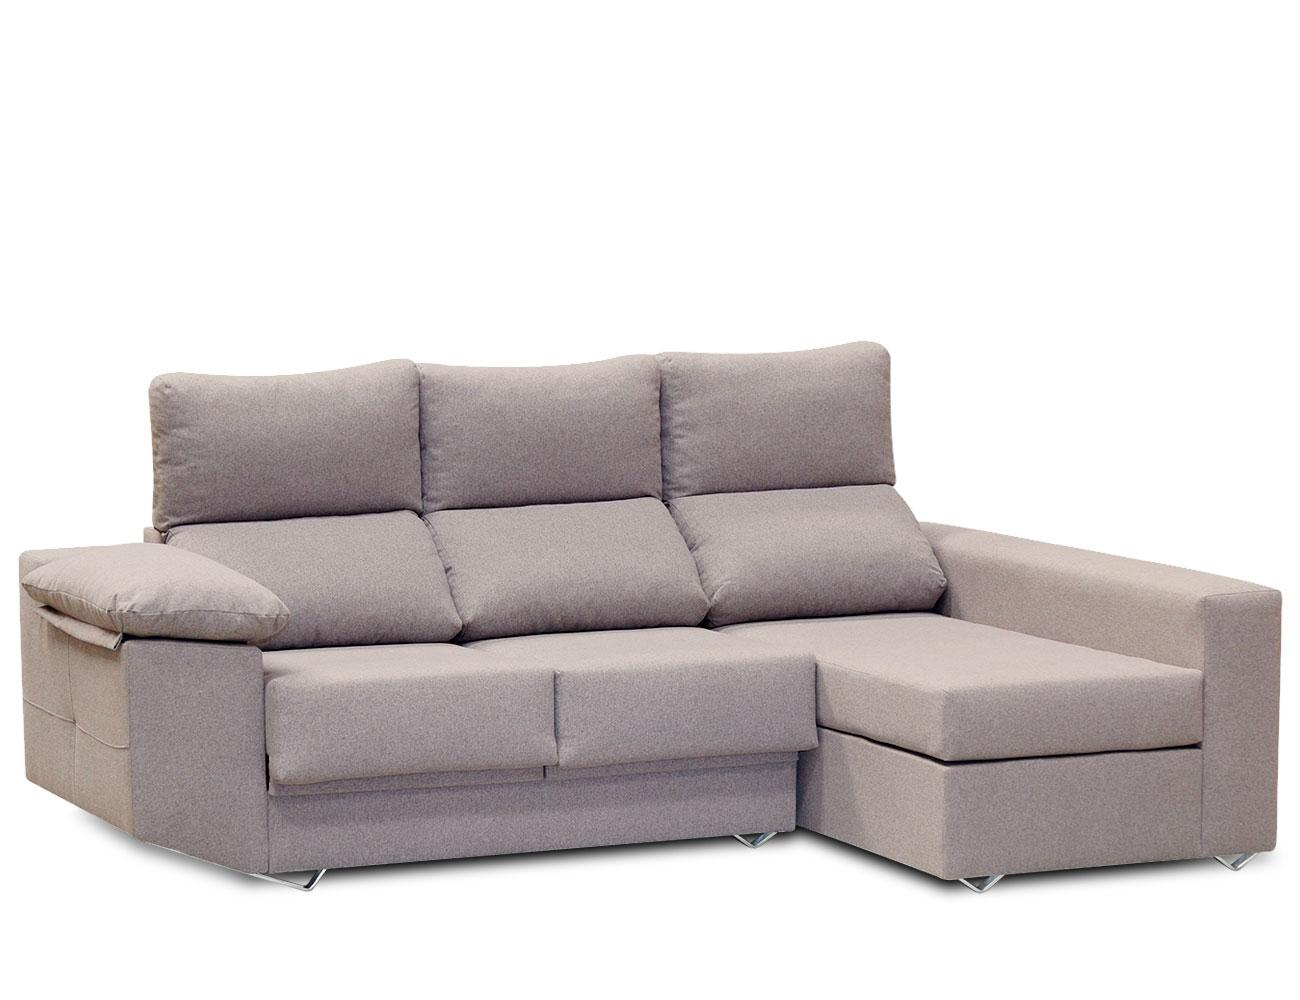 Sofa chaiselongue moderno piedra 4